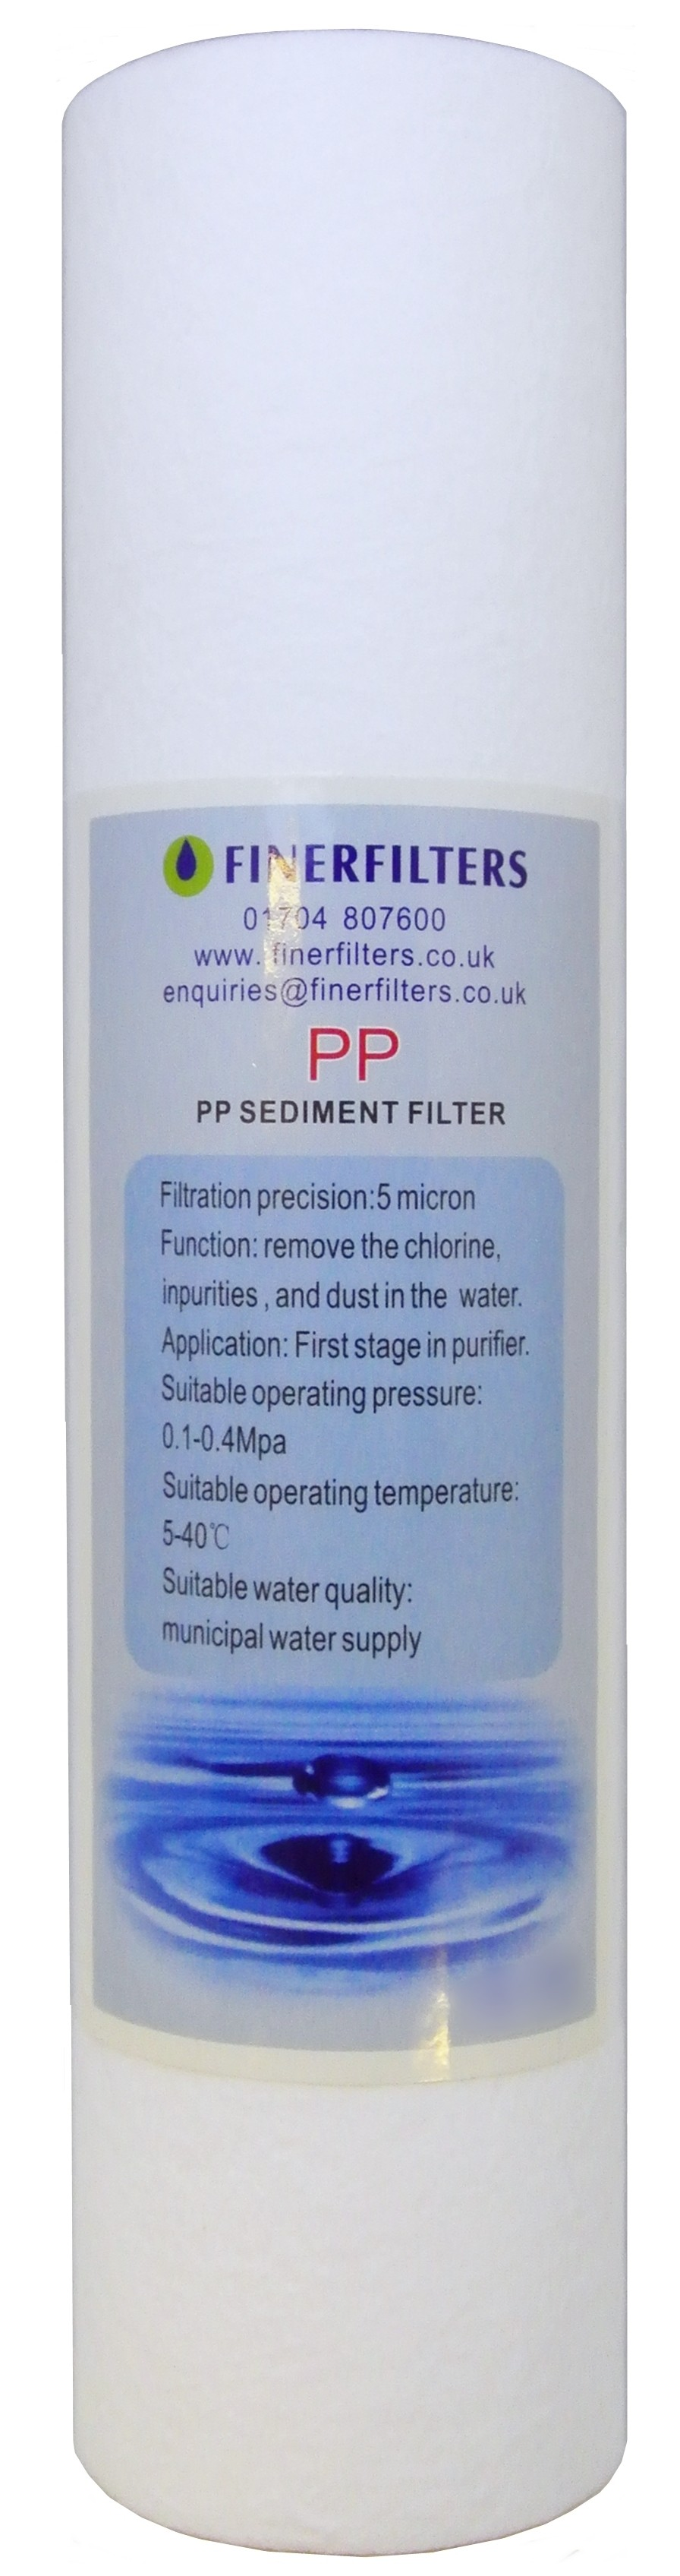 10 Inch 5 Micron Sediment Filter Cartridge - Spun PolyPropylene